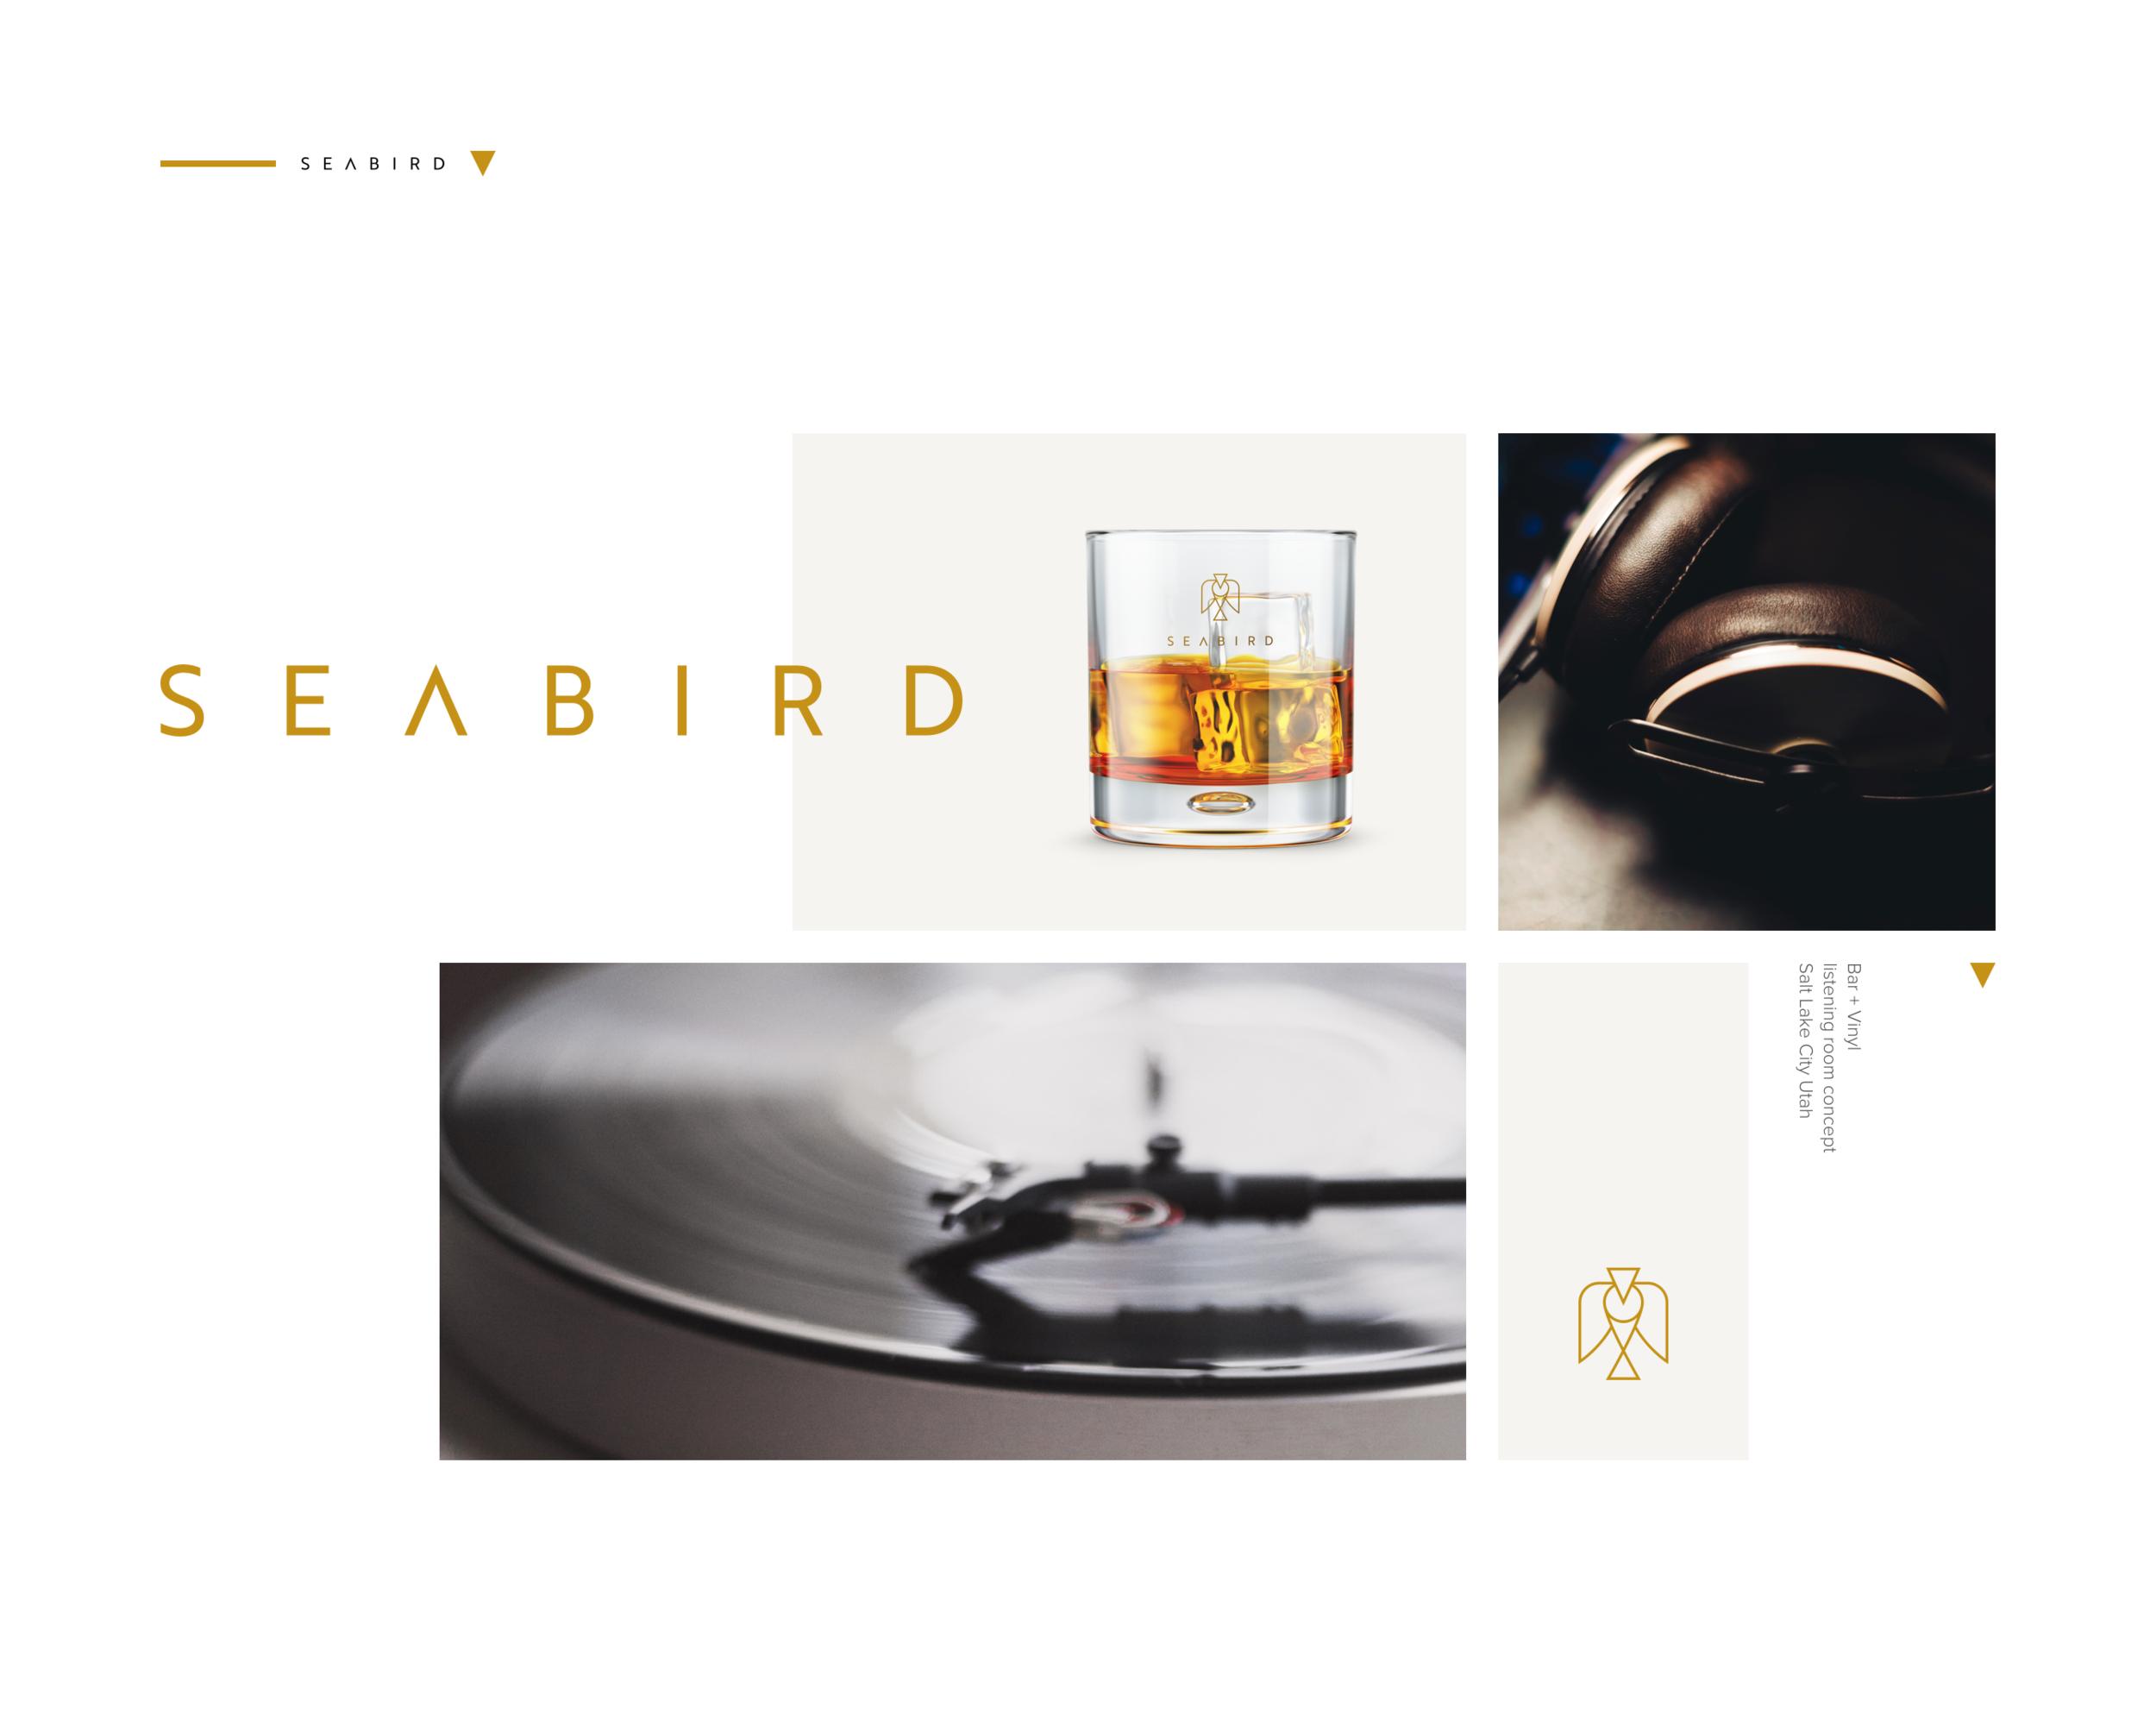 Design By DIamond - Seabird - Typography